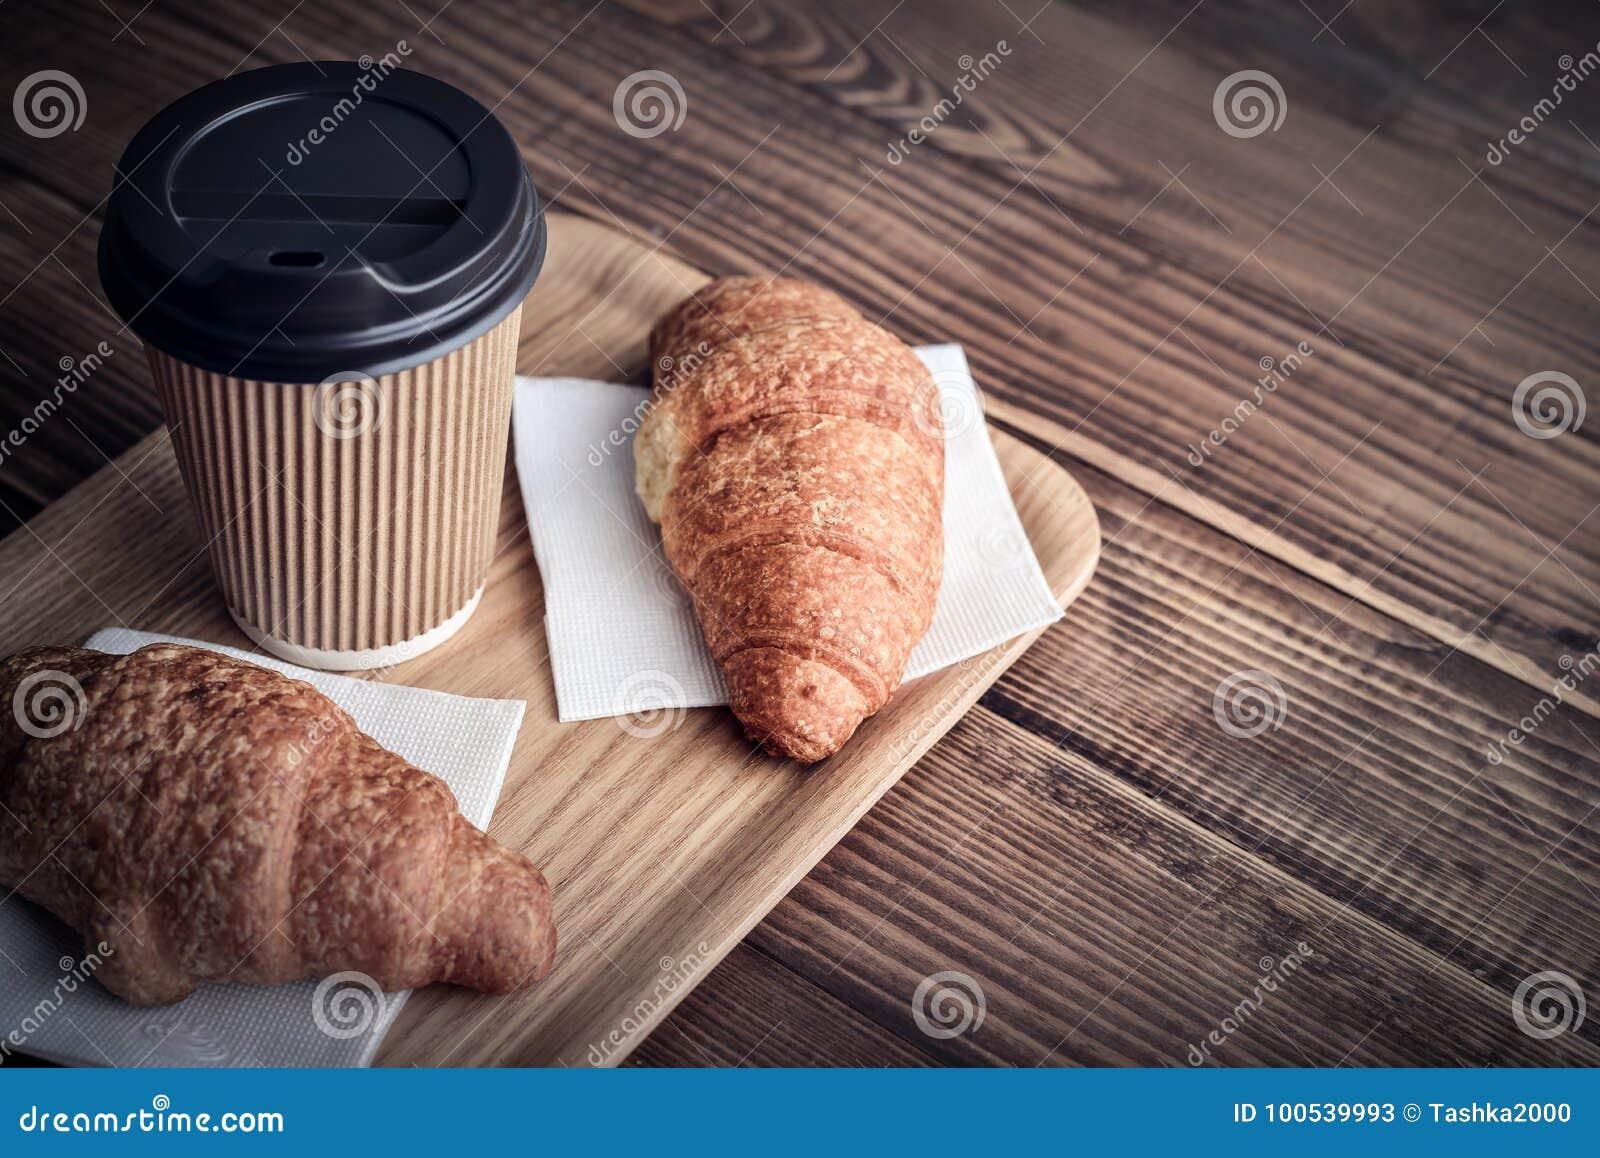 Due croissant e caffè--vanno